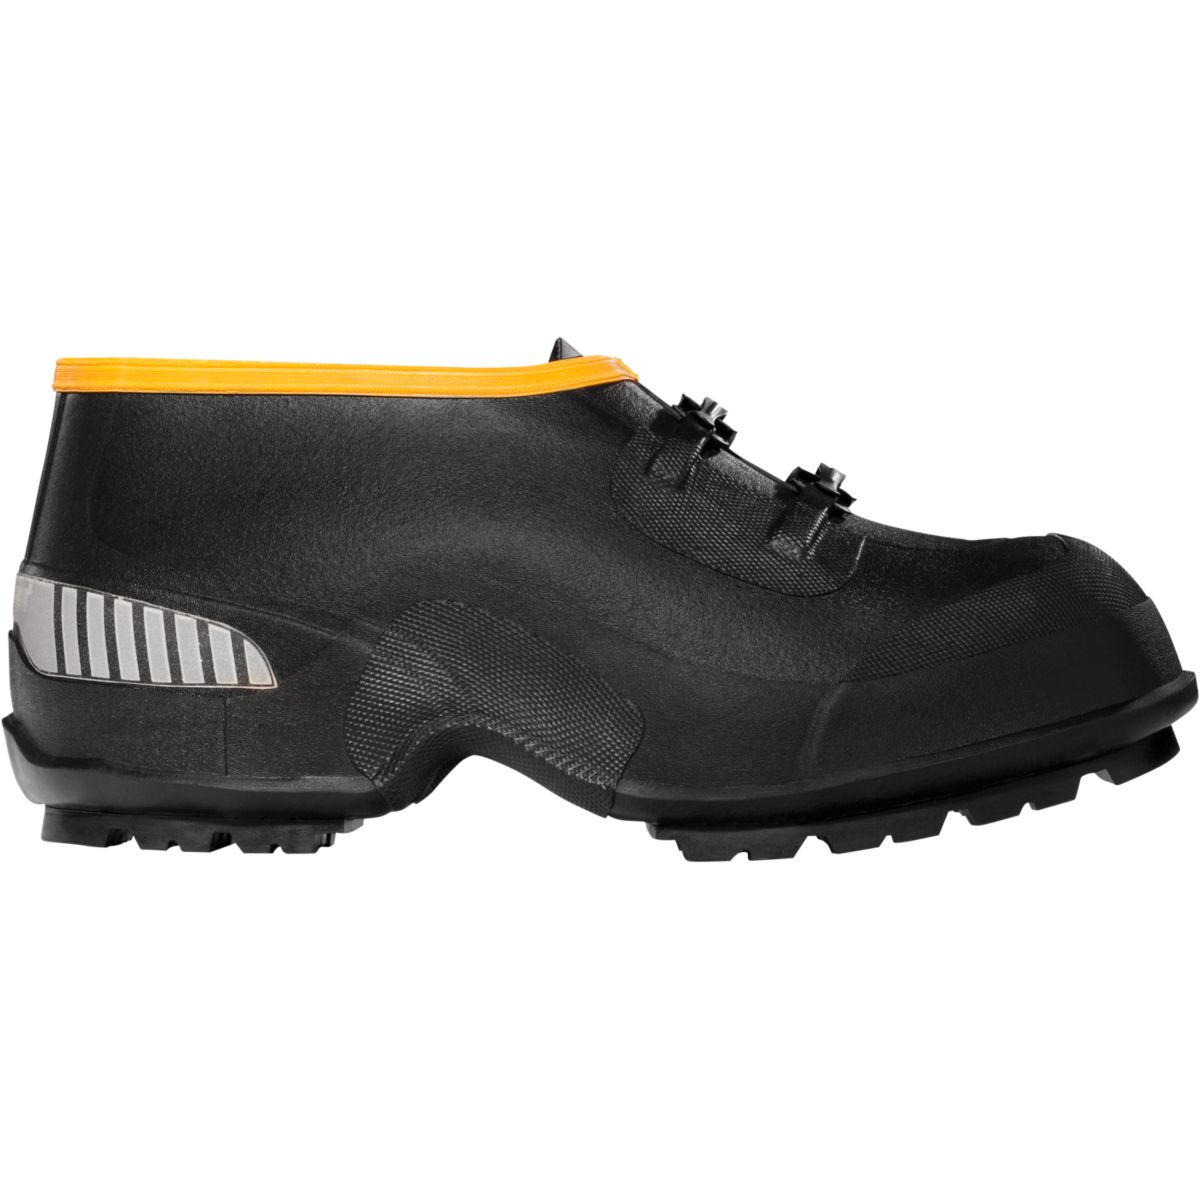 LaCrosse 229107-9 Men's 5 Inch ATS Overshoe Carbide Stud Work Boot by Lacrosse-Rainfair